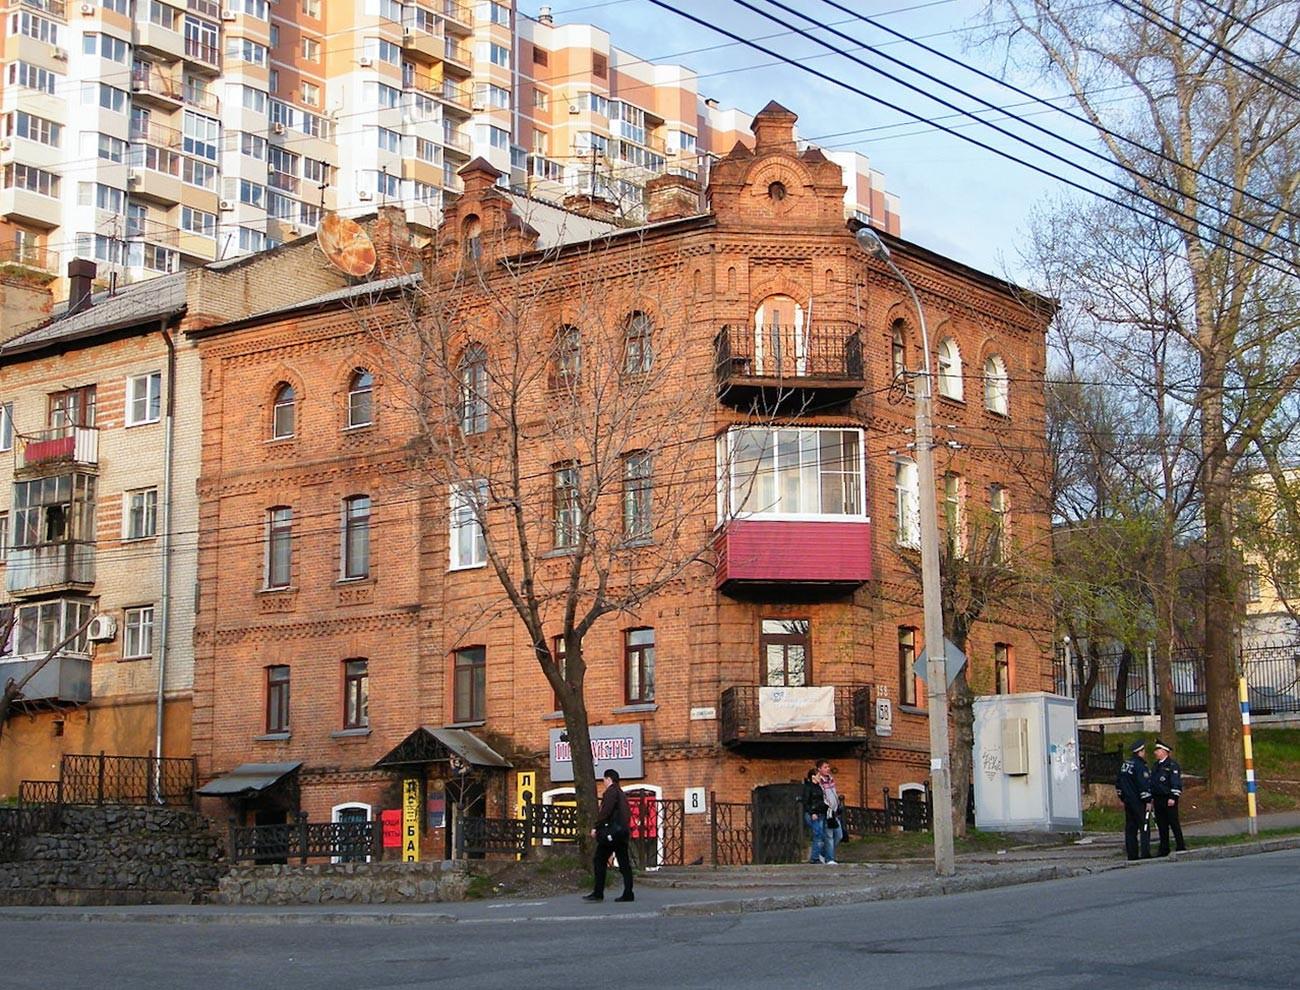 Tifontai's house at Sovetskaya Street 8 in Khabarovsk